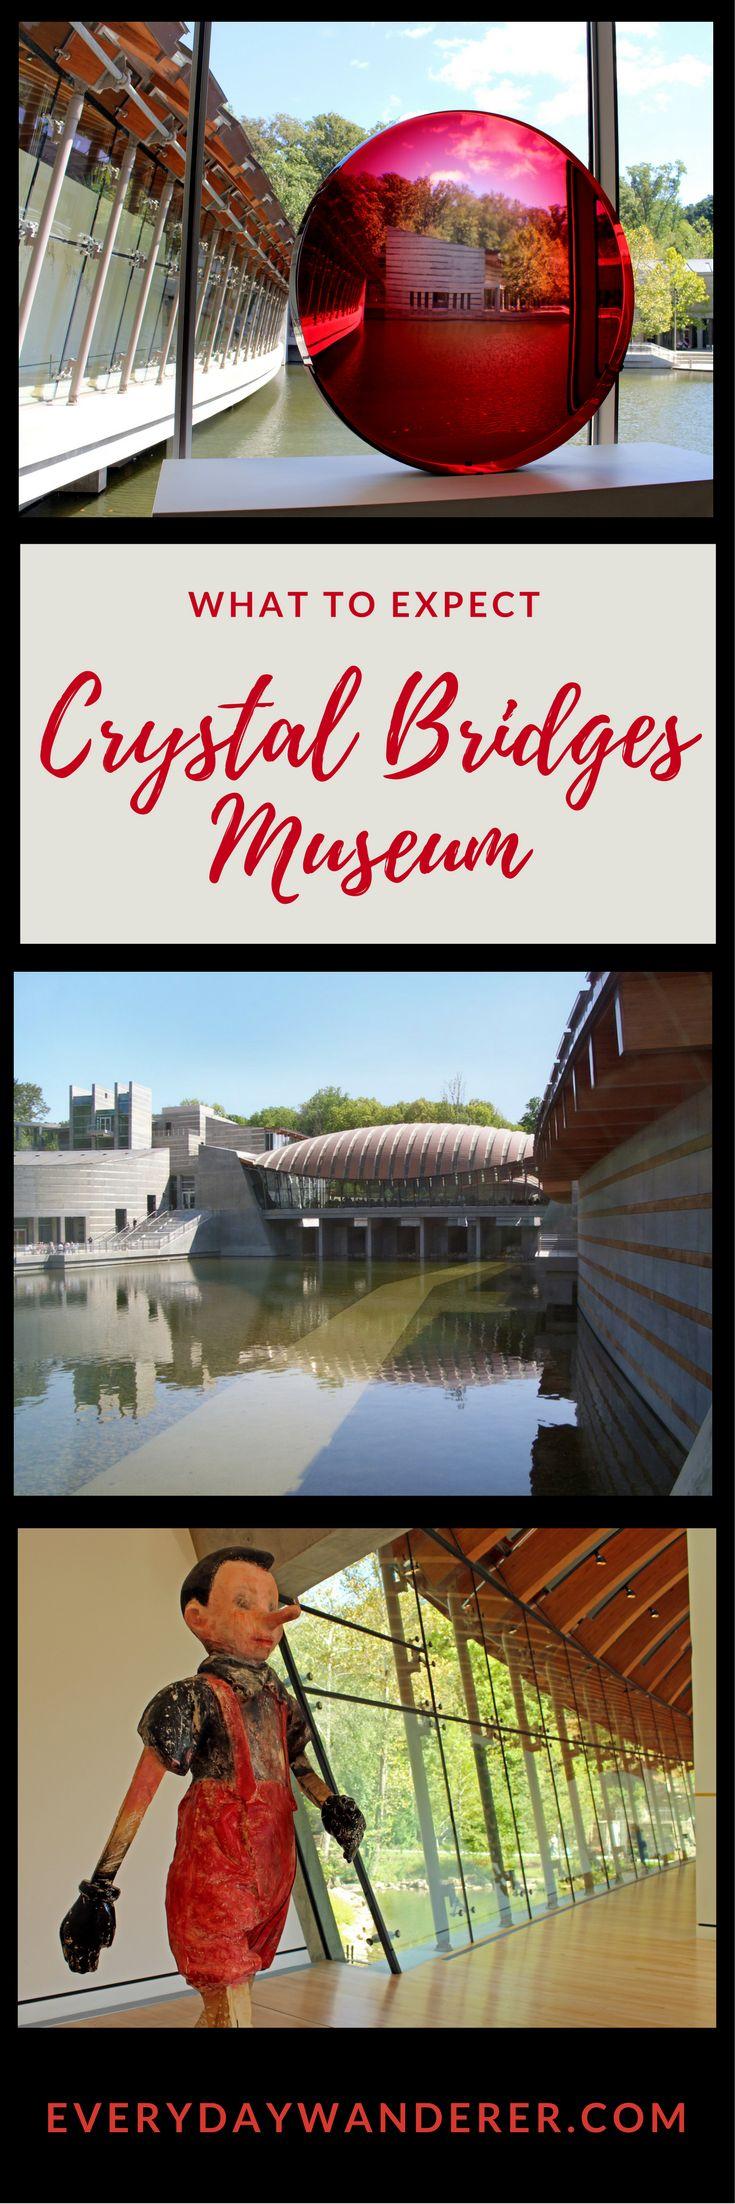 Crystal Bridges Museum of American Art in Bentonville, Arkansas.  What to expect when you visit.  #artmuseums #art #arkansas